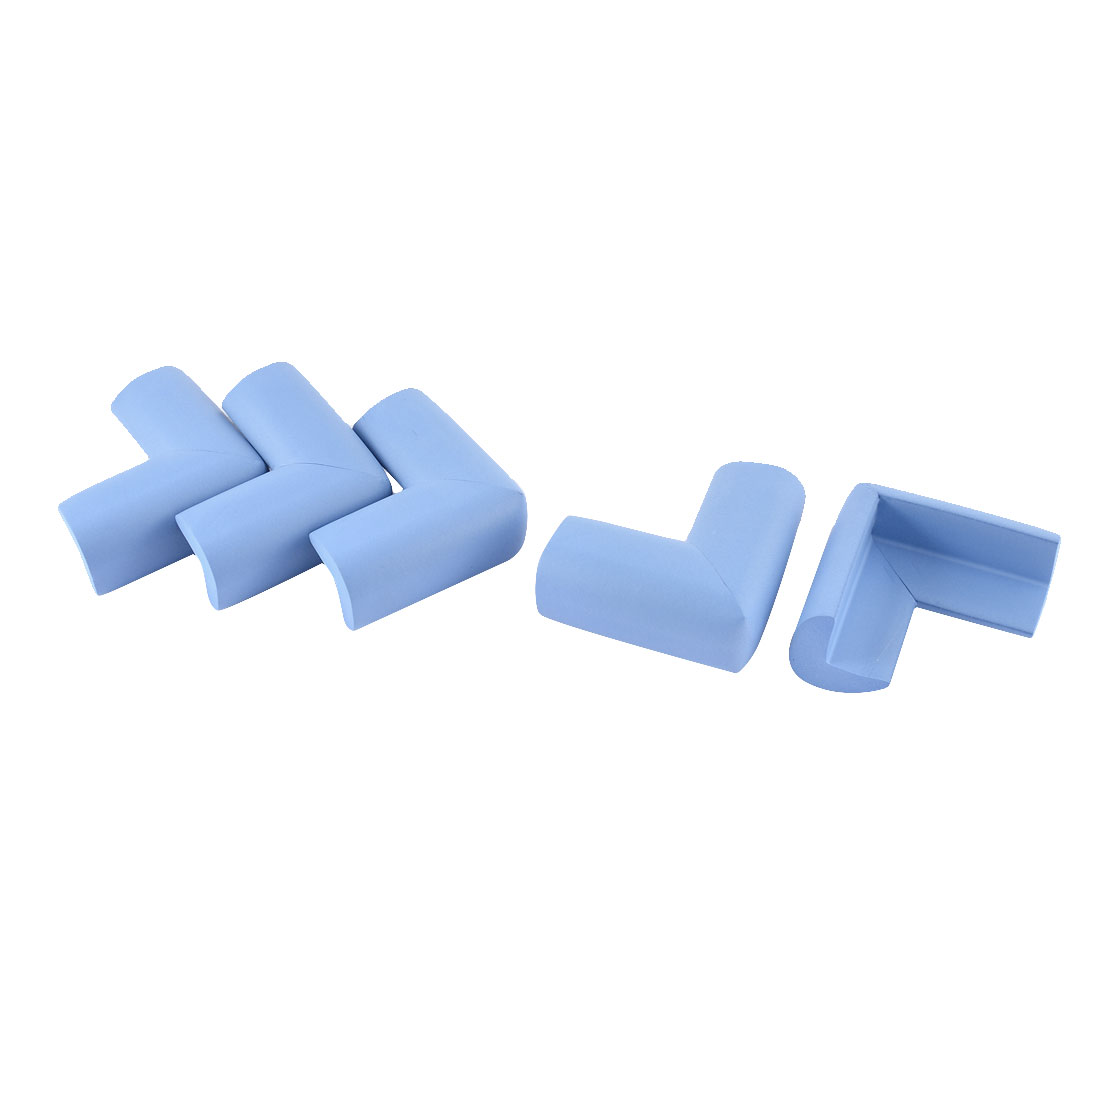 L Shape Cushion Softner Furniture Corner Edge Guard Protector Blue 5 Pcs